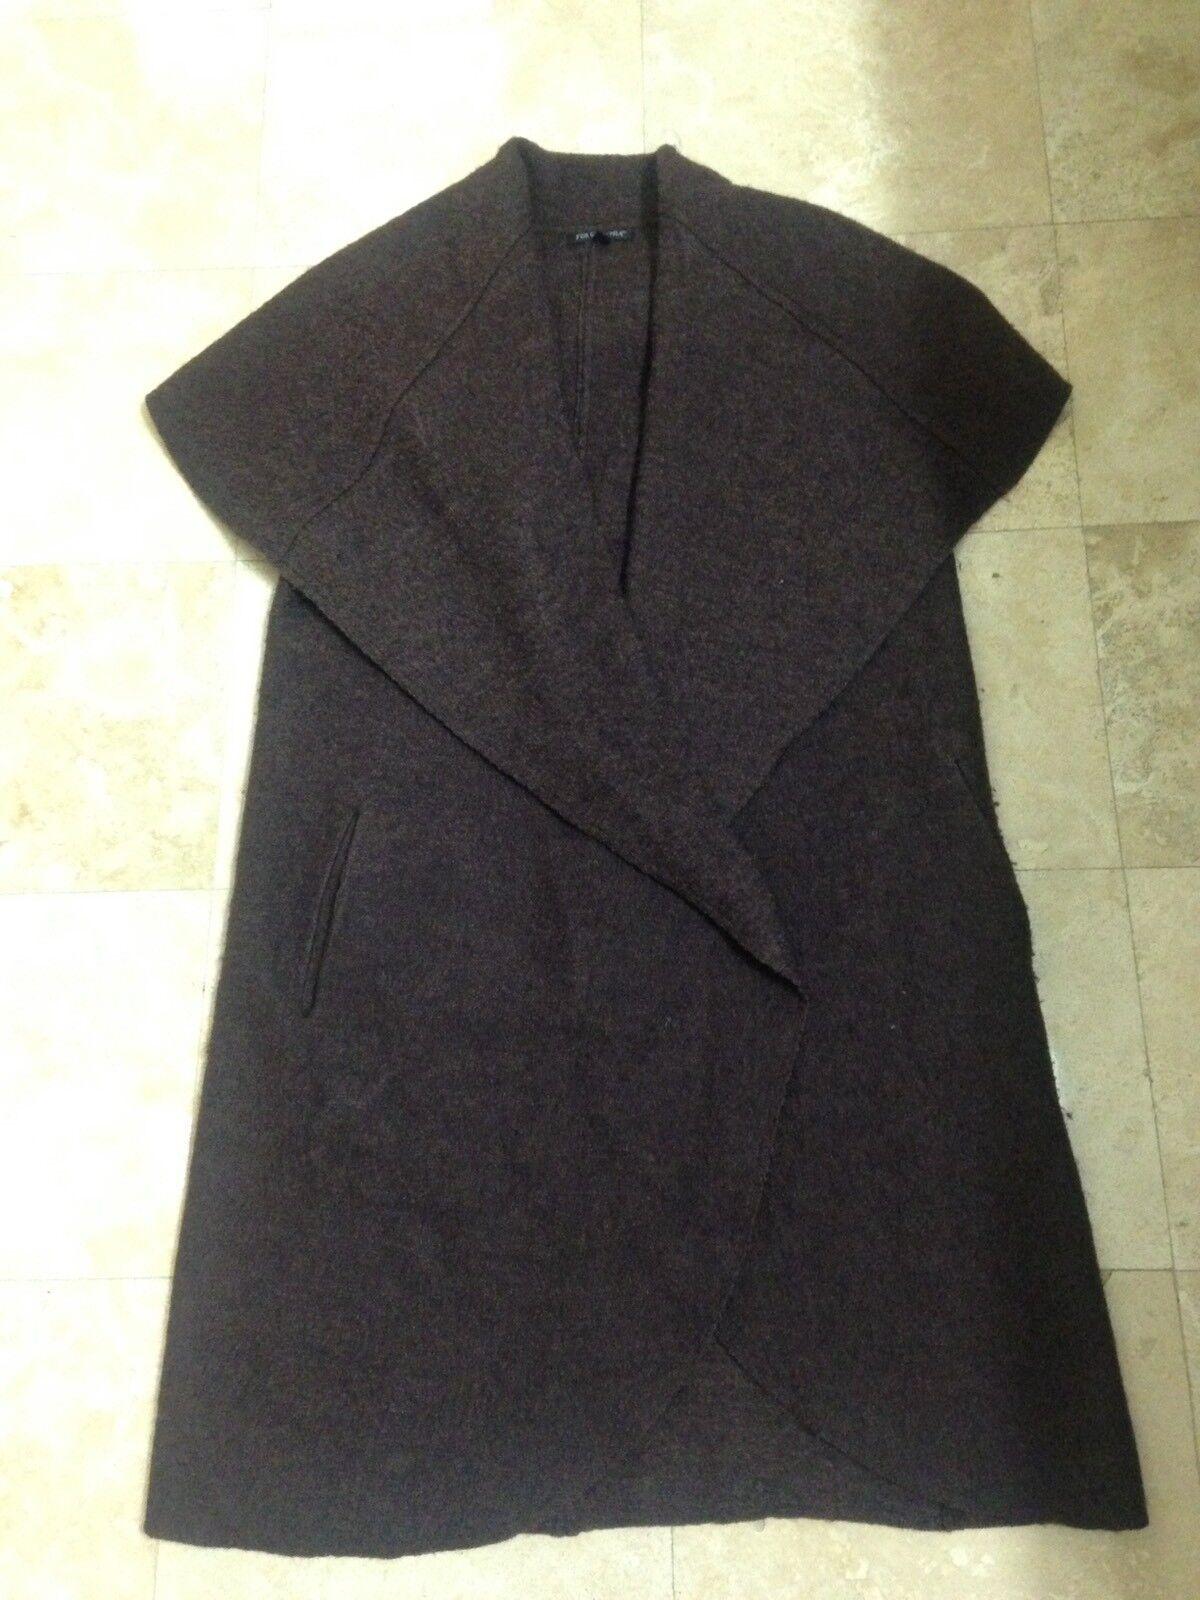 FOR CYNTHIA Long Brown Shawl Collar Sleeveless Wool Blend Vest